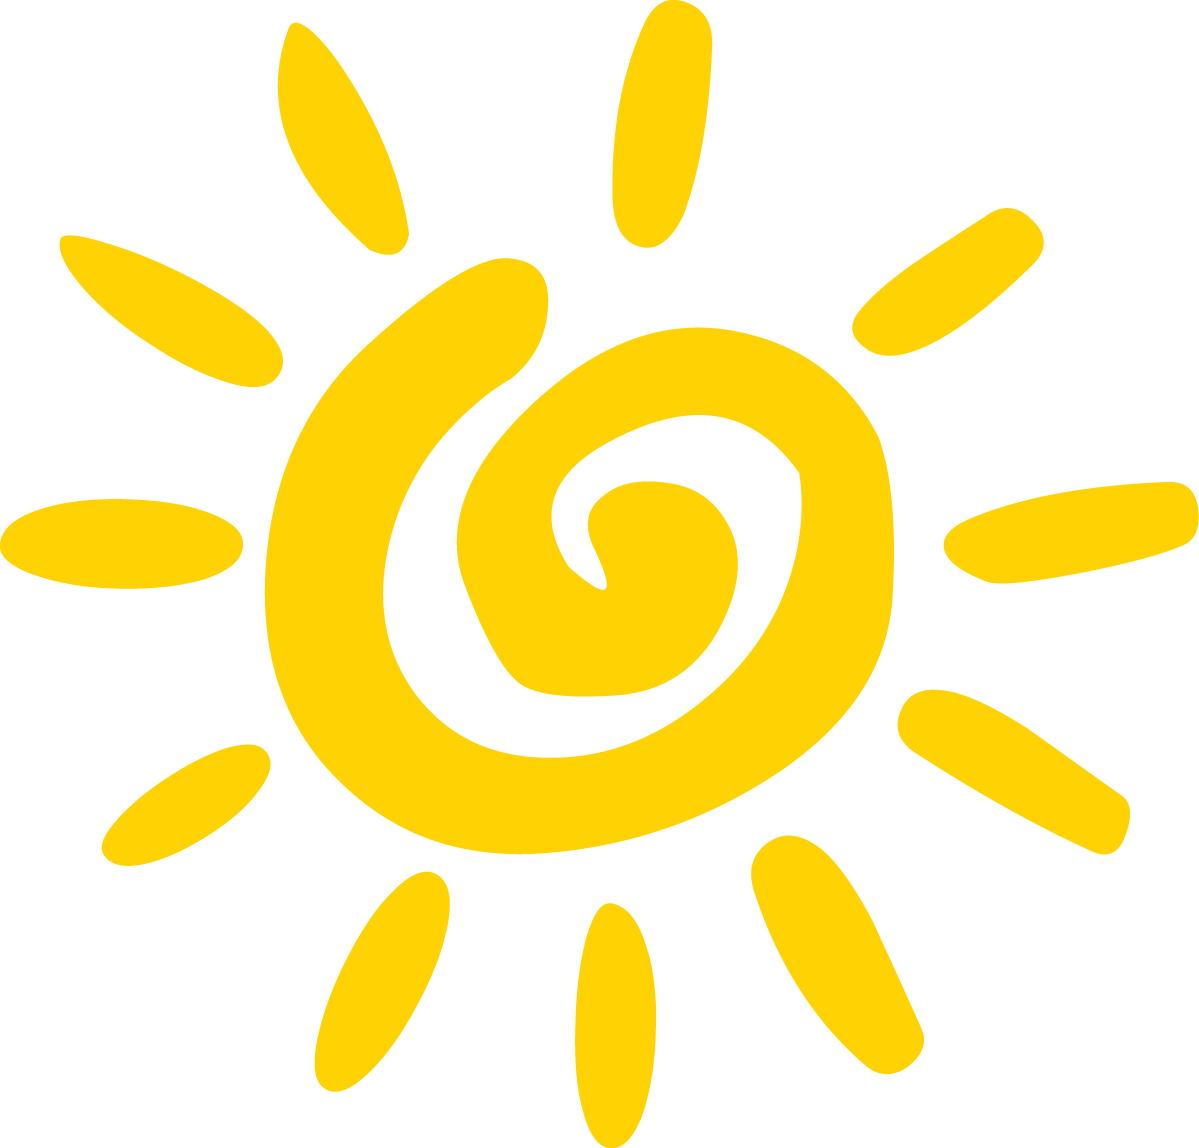 Sun Clipart Free Images At Clker Com Vec-Sun Clipart Free Images At Clker Com Vector Clip Art Online-8